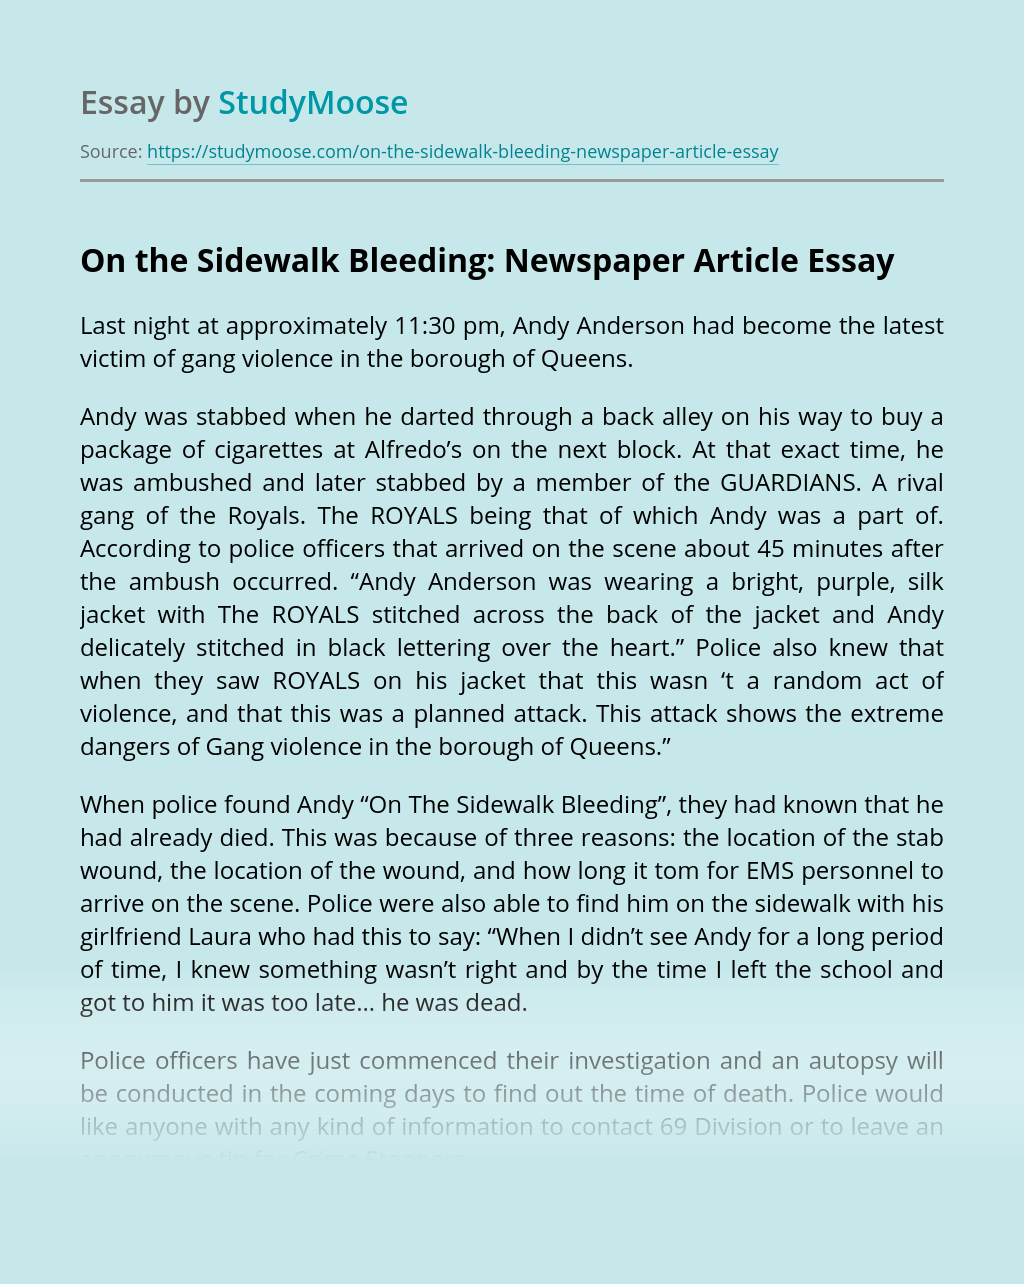 On the Sidewalk Bleeding: Newspaper Article